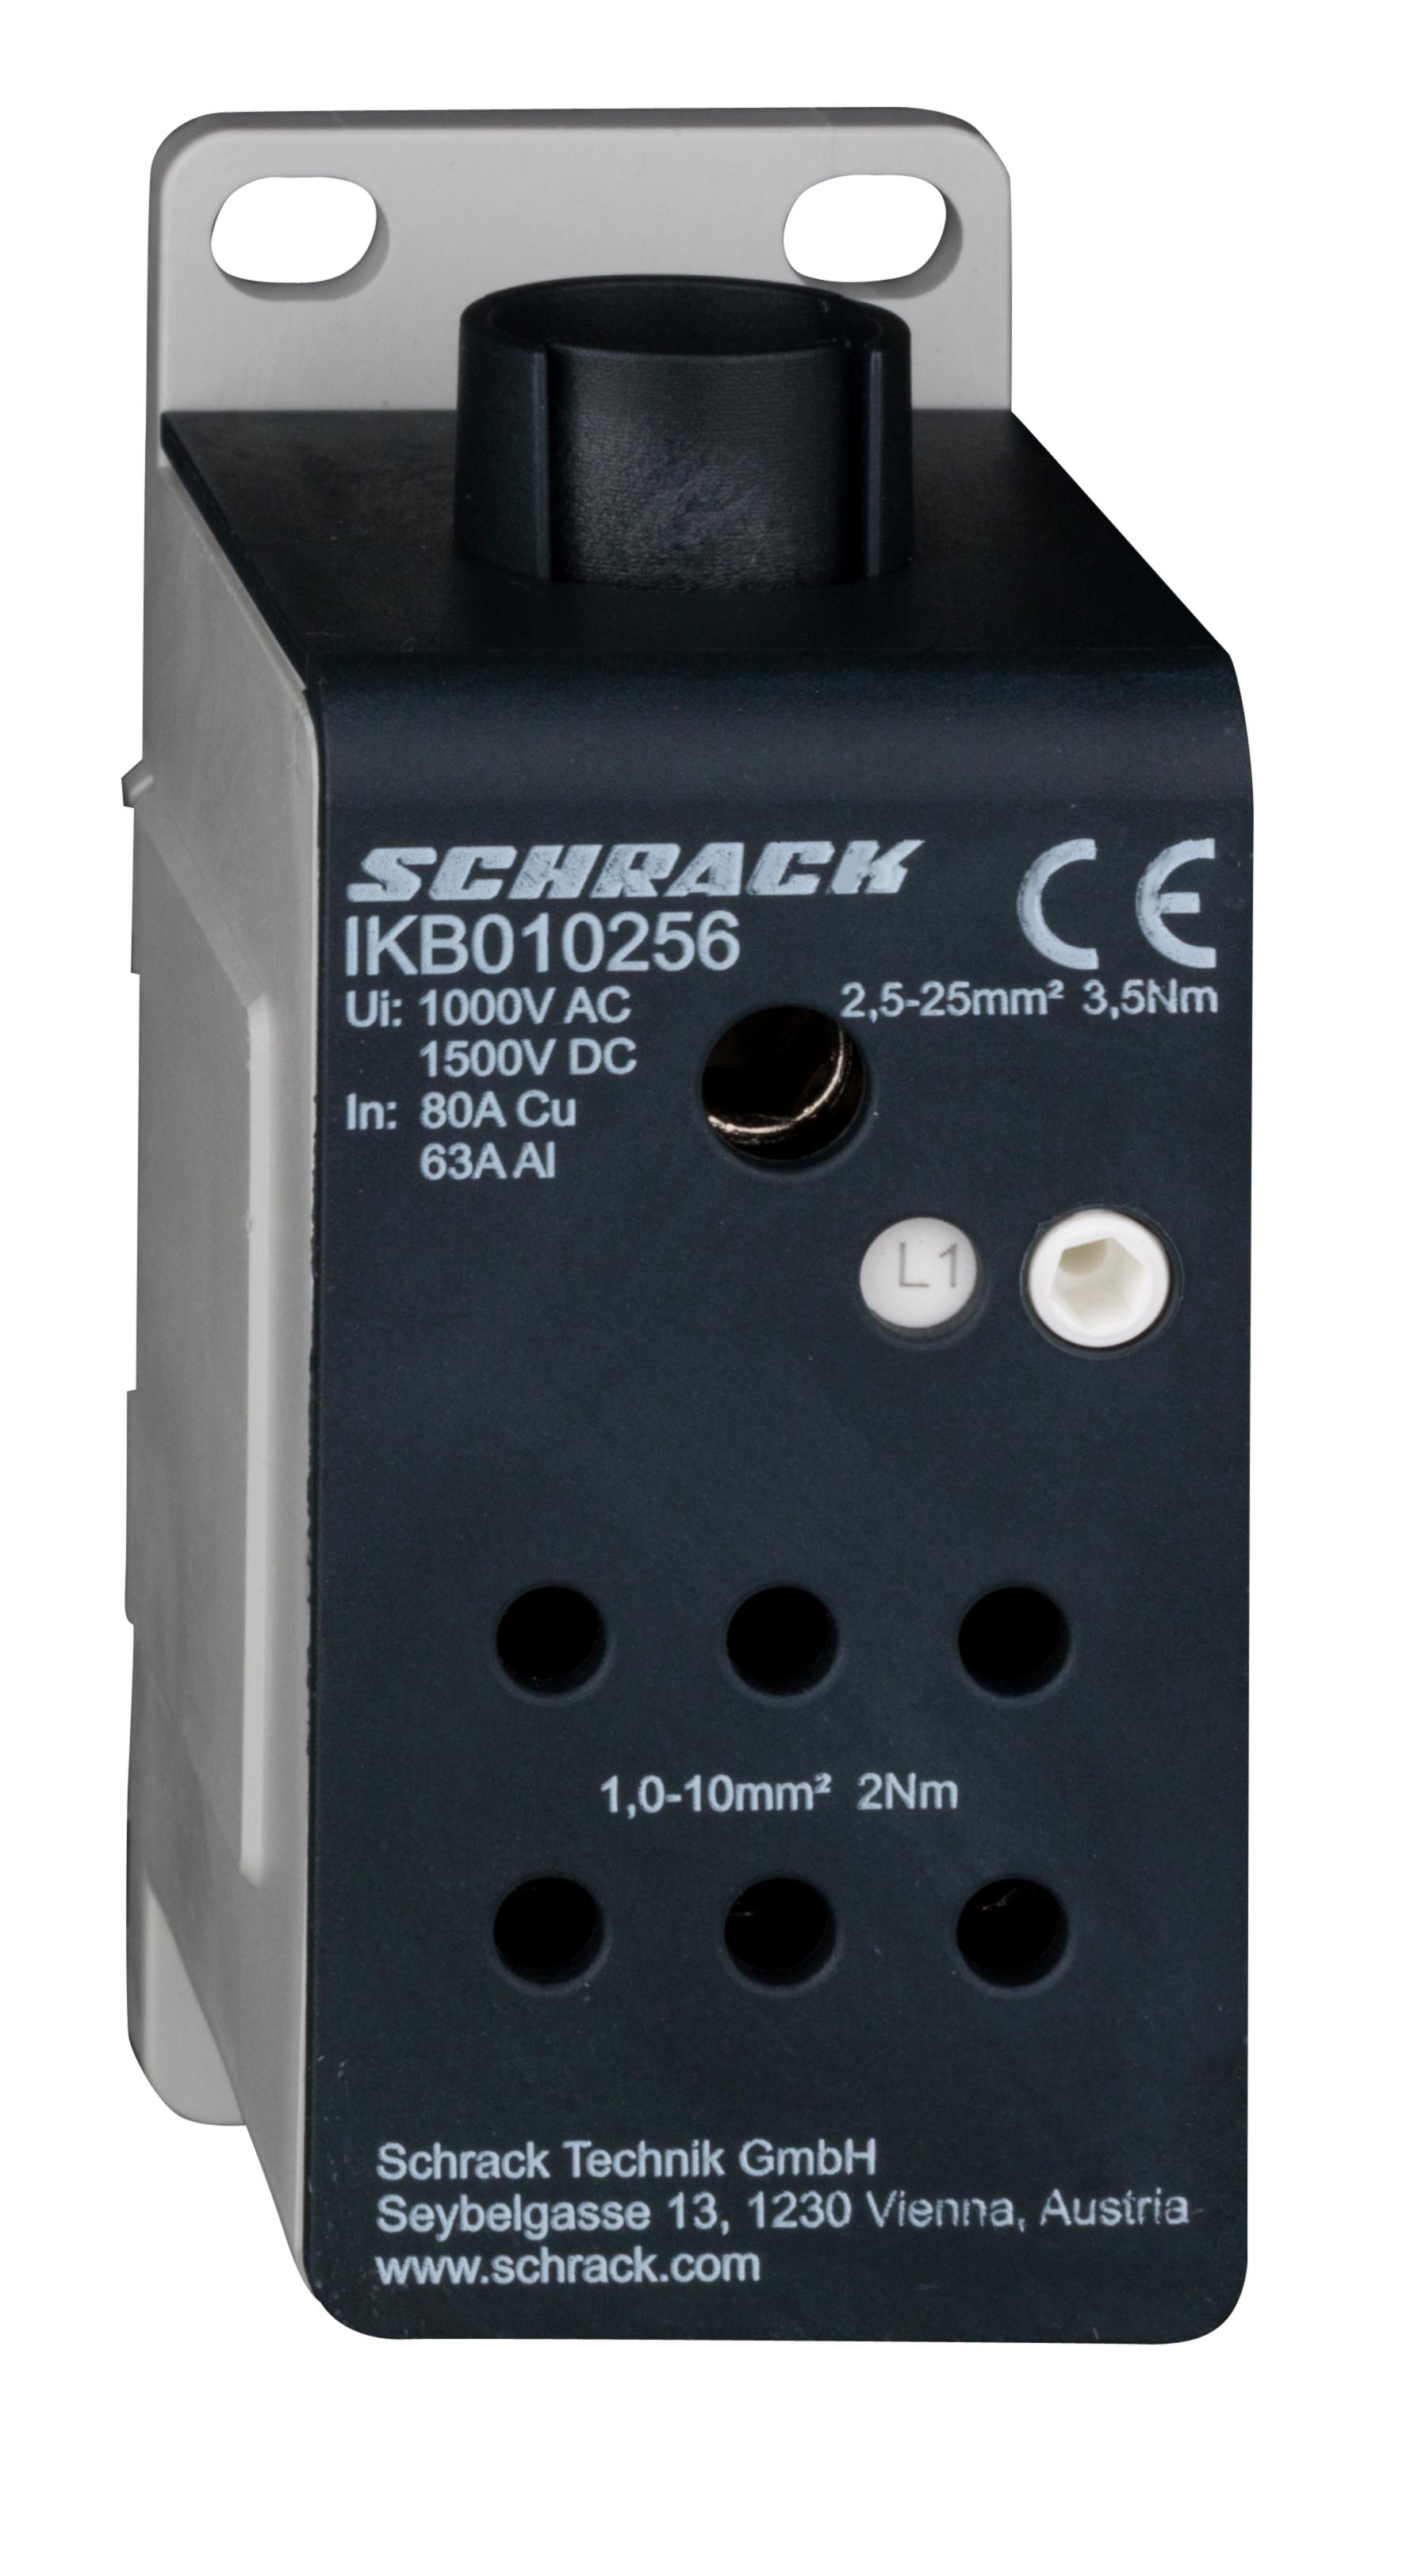 1 Stk ALU -Anschlussblock, 1-polig, 80A, zu 1x25mm², ab 6x 10mm² IKB010256-